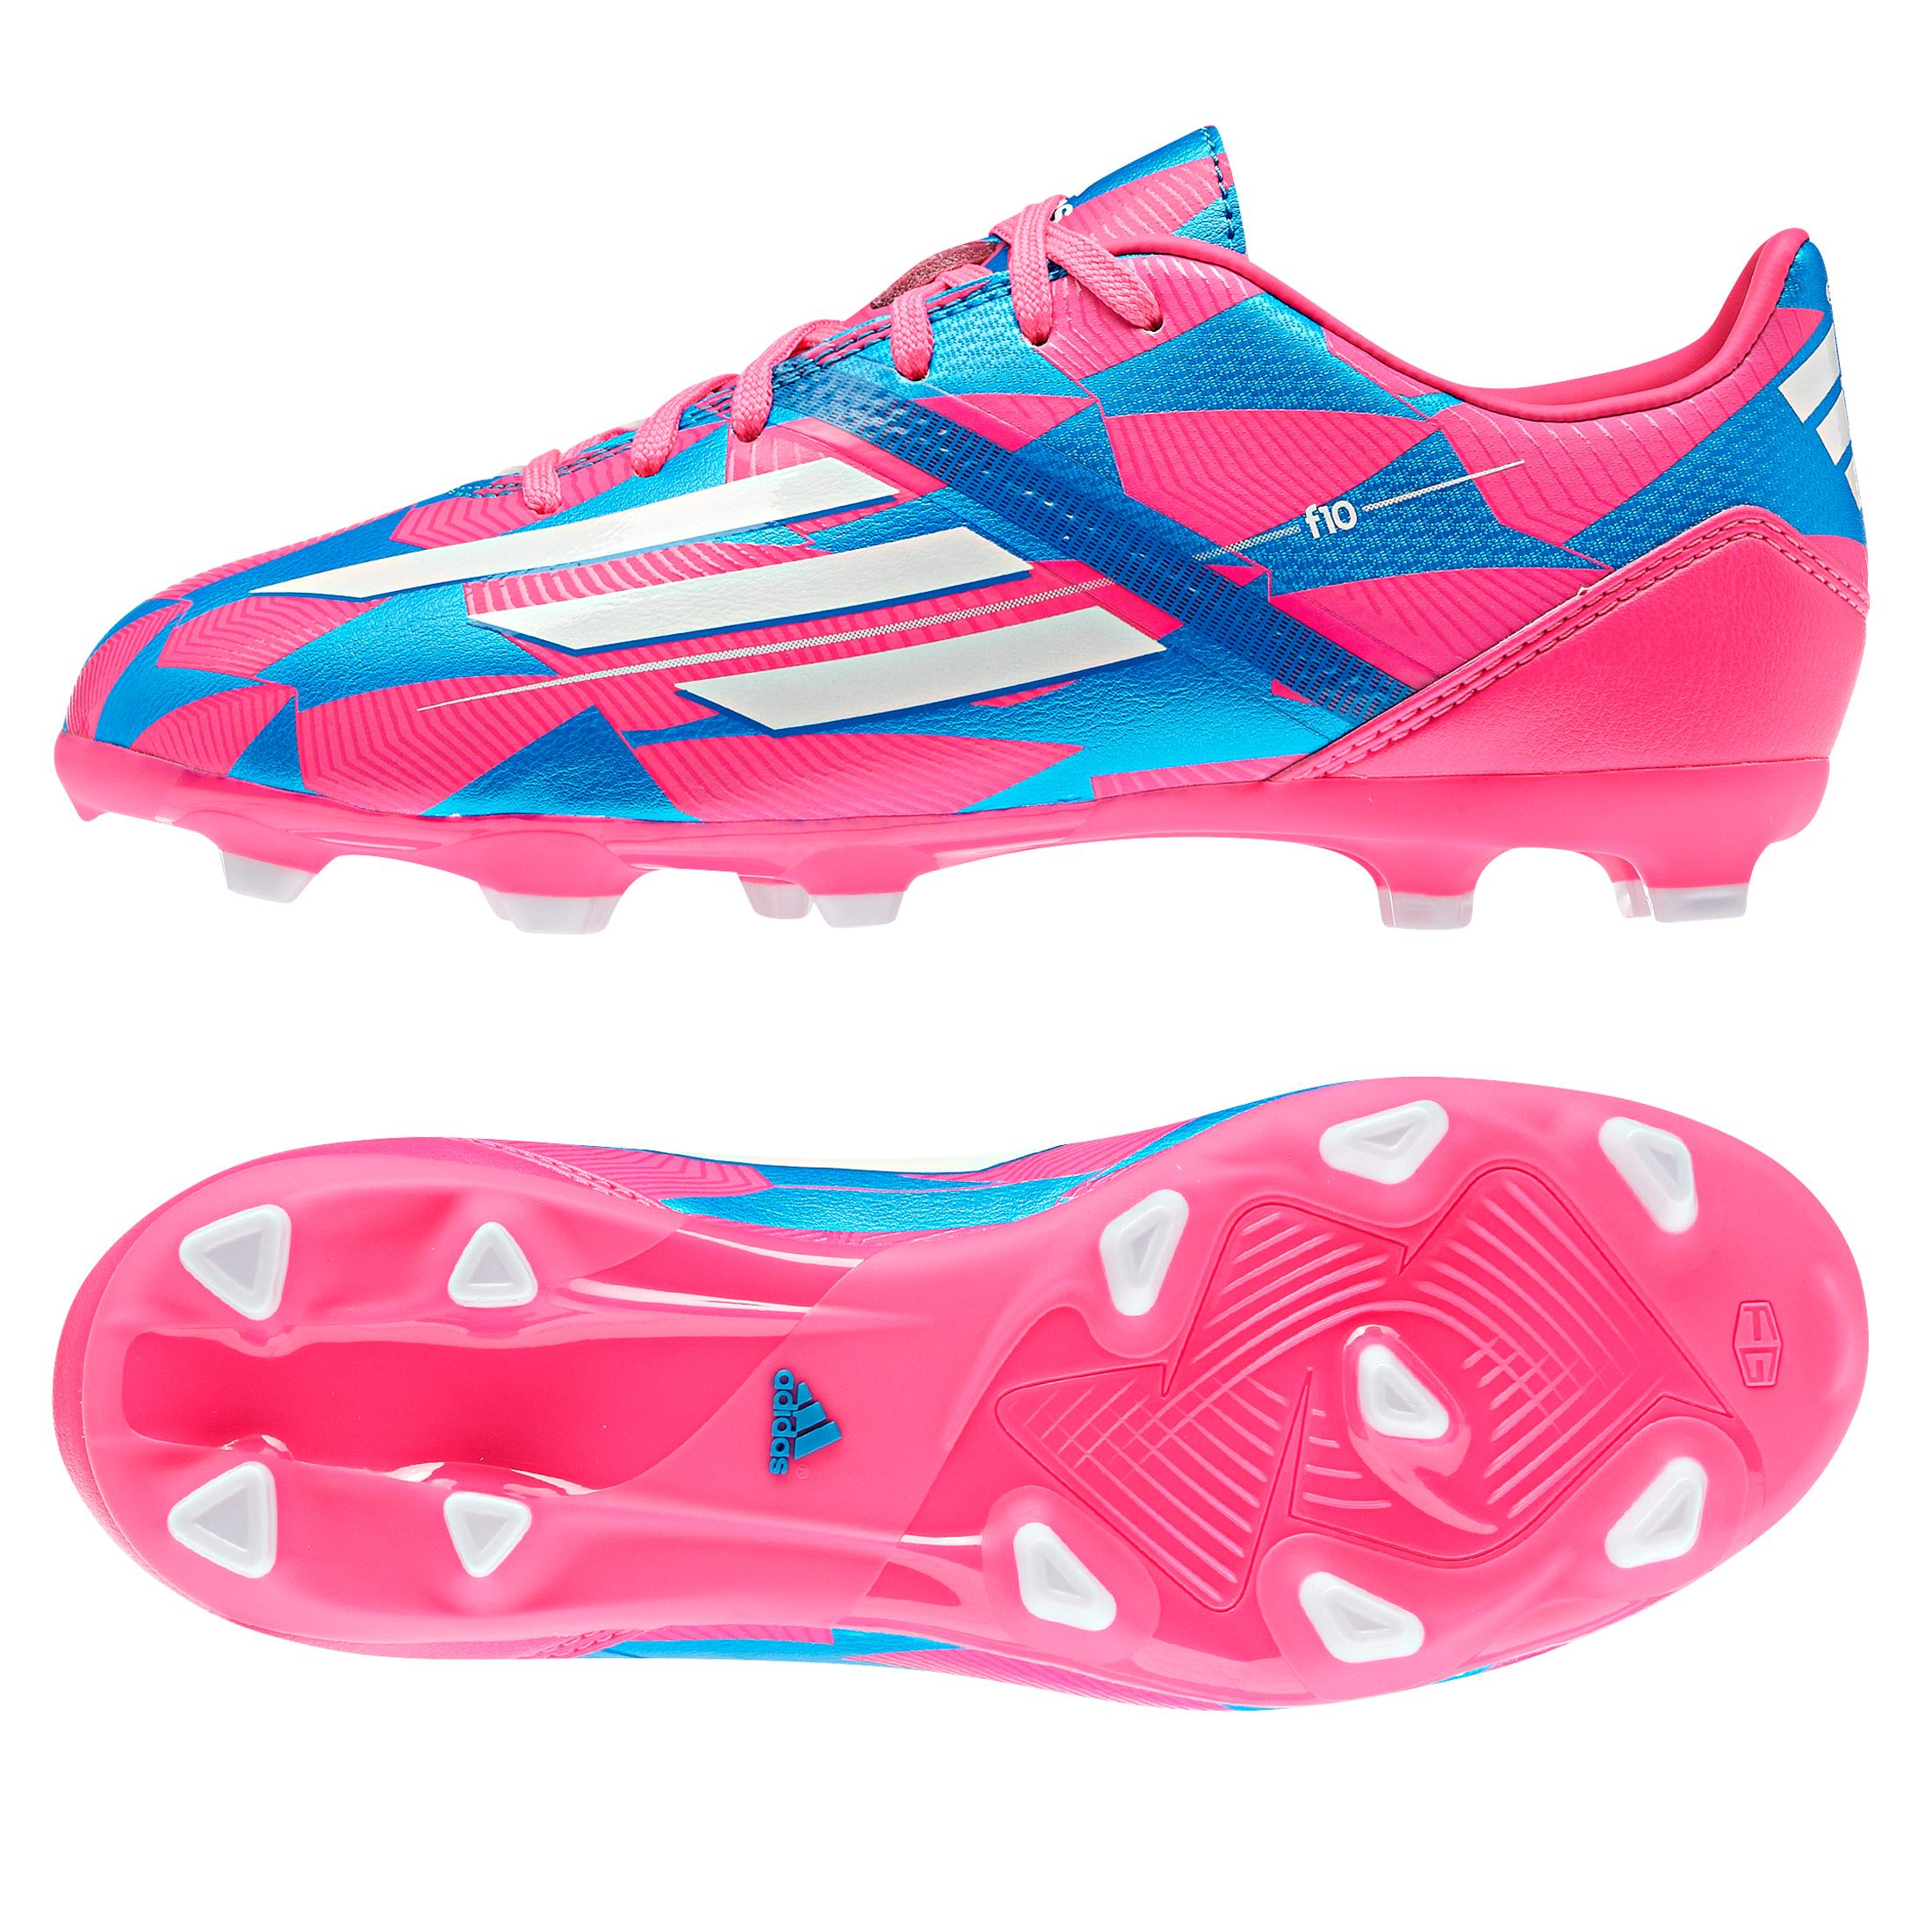 Adidas F10 Firm Ground Football Boots - Kids Pink